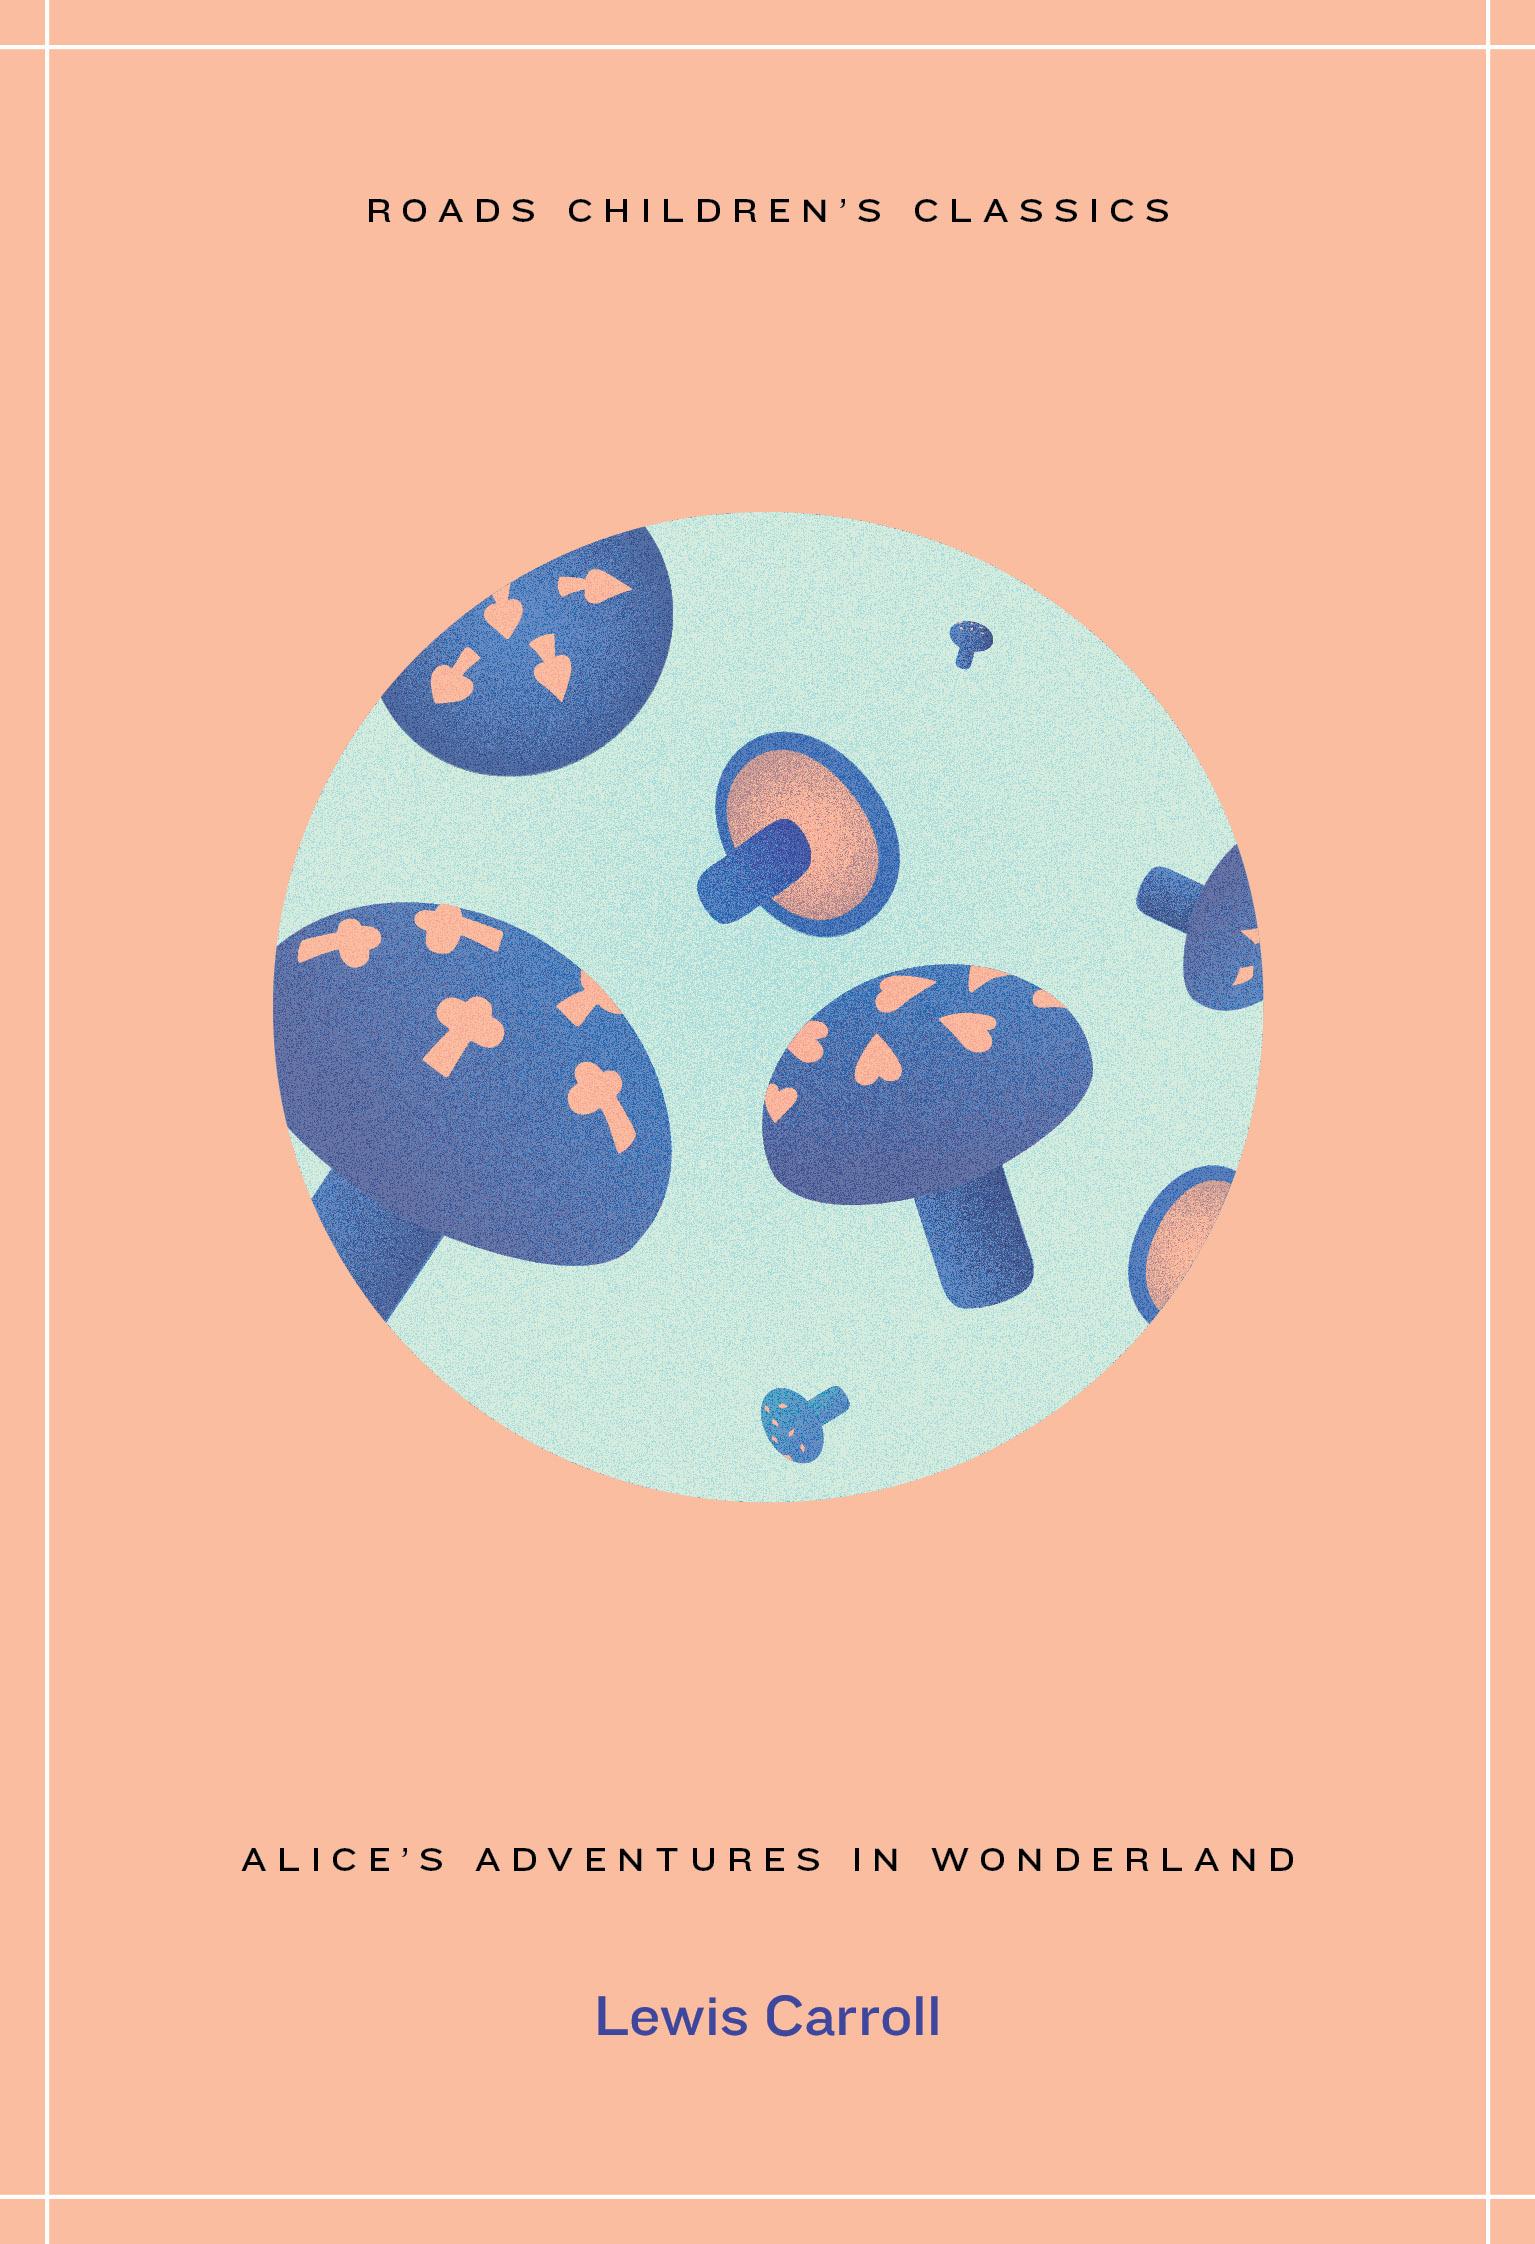 Cover image: Alice's Adventures in Wonderland